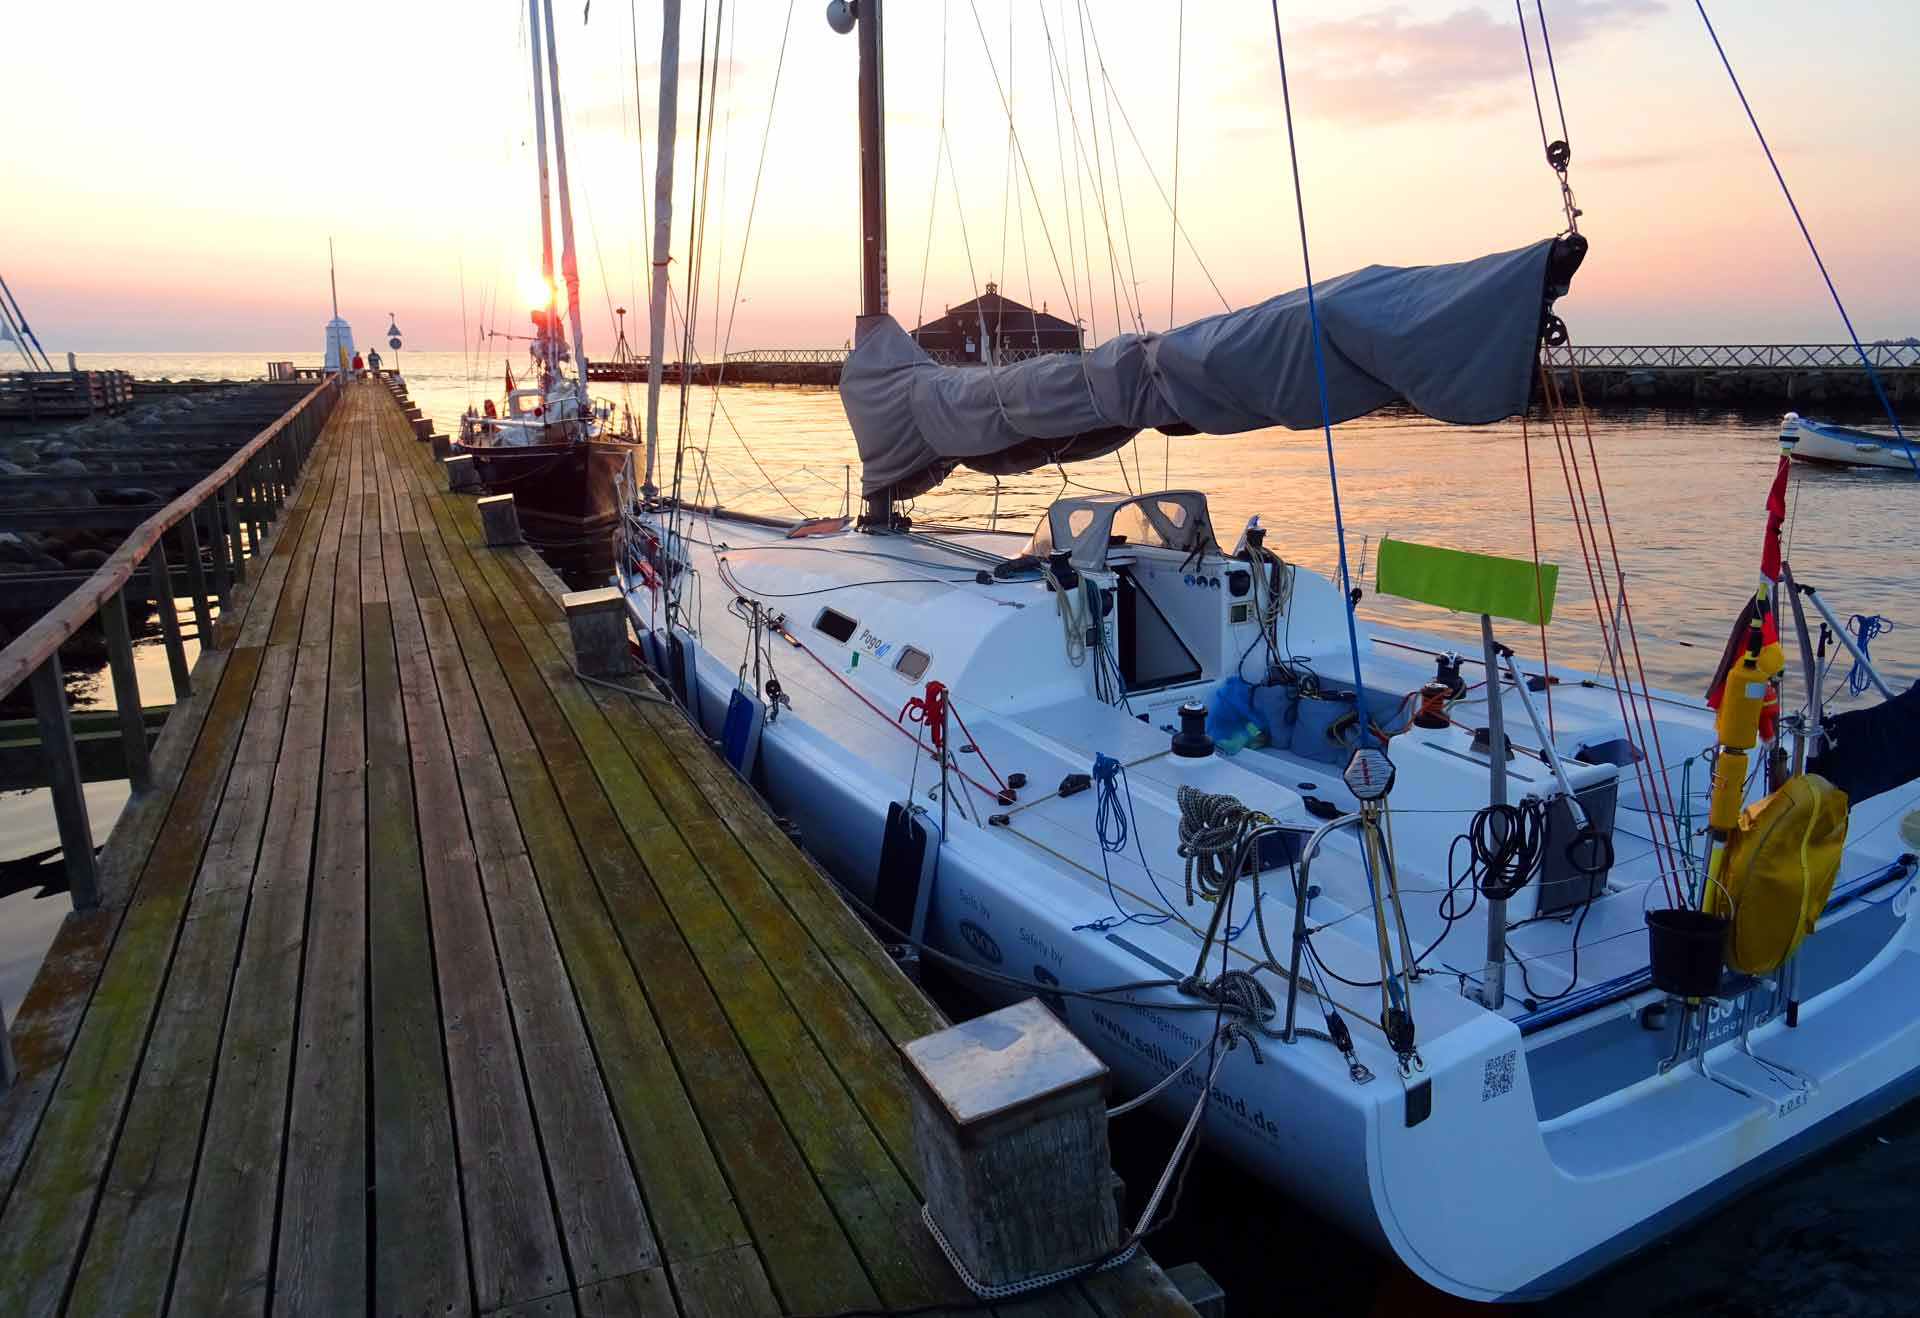 Mooring in Kerteminde harbor. Quite a nice berth.